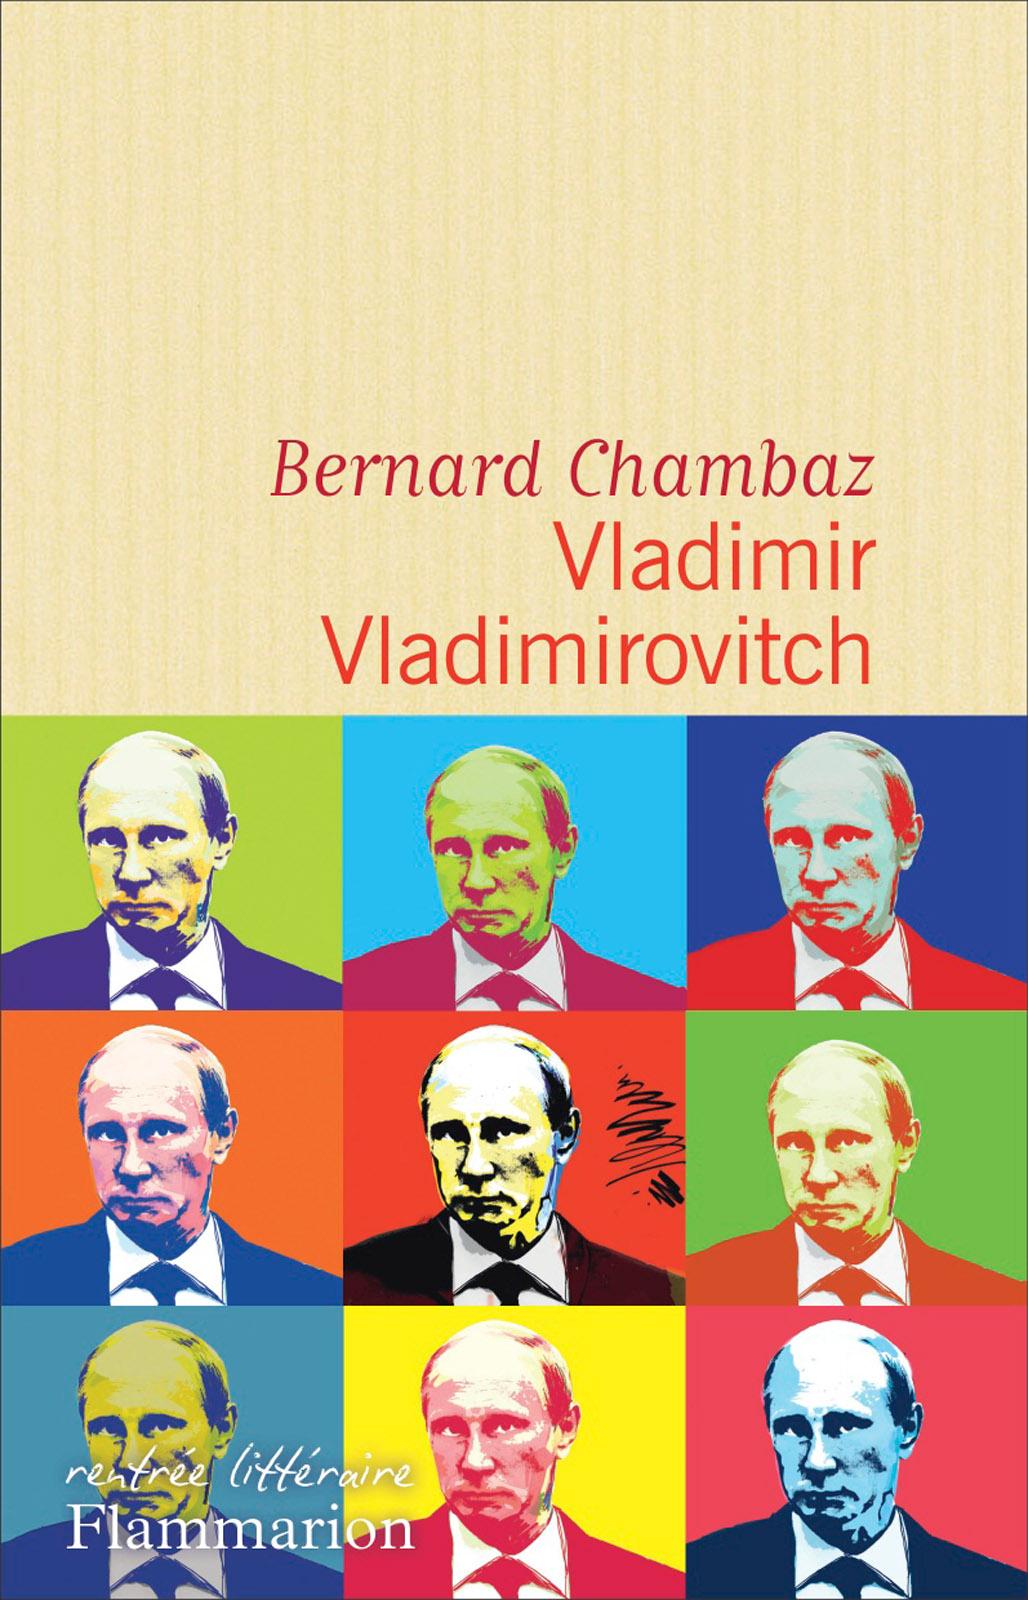 Vladimir Vladimirovitch | Chambaz, Bernard